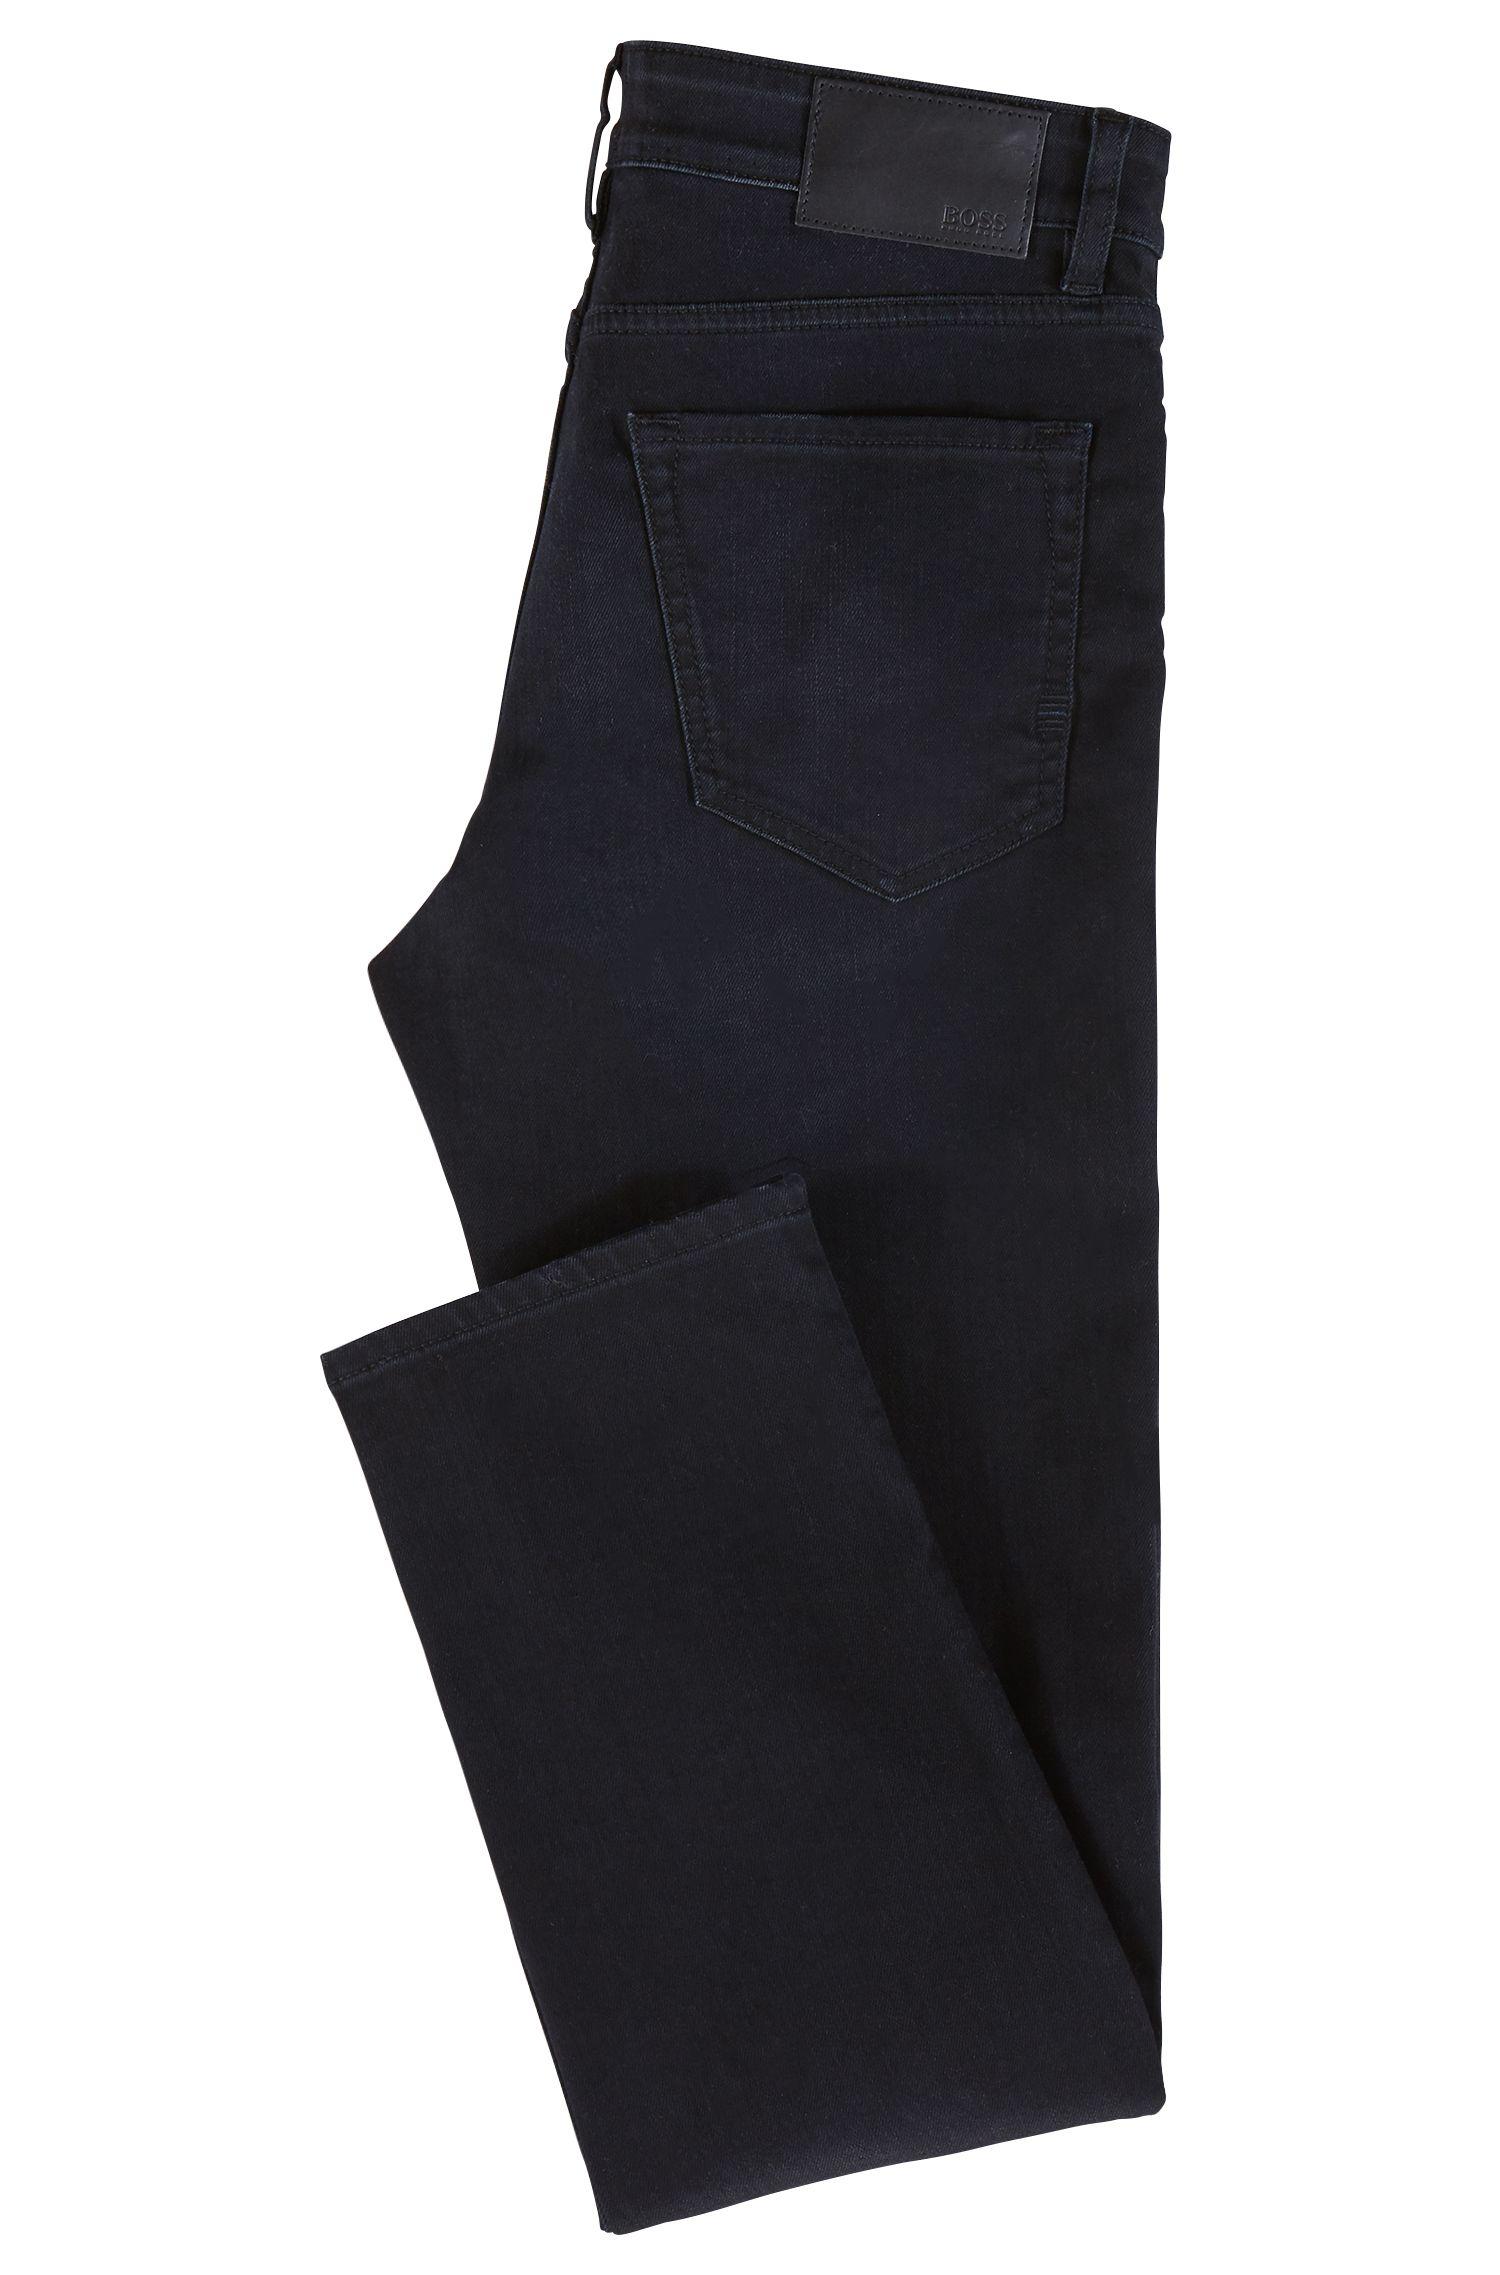 Vaqueros regular fit en denim elástico añil con teñido especial, Azul oscuro